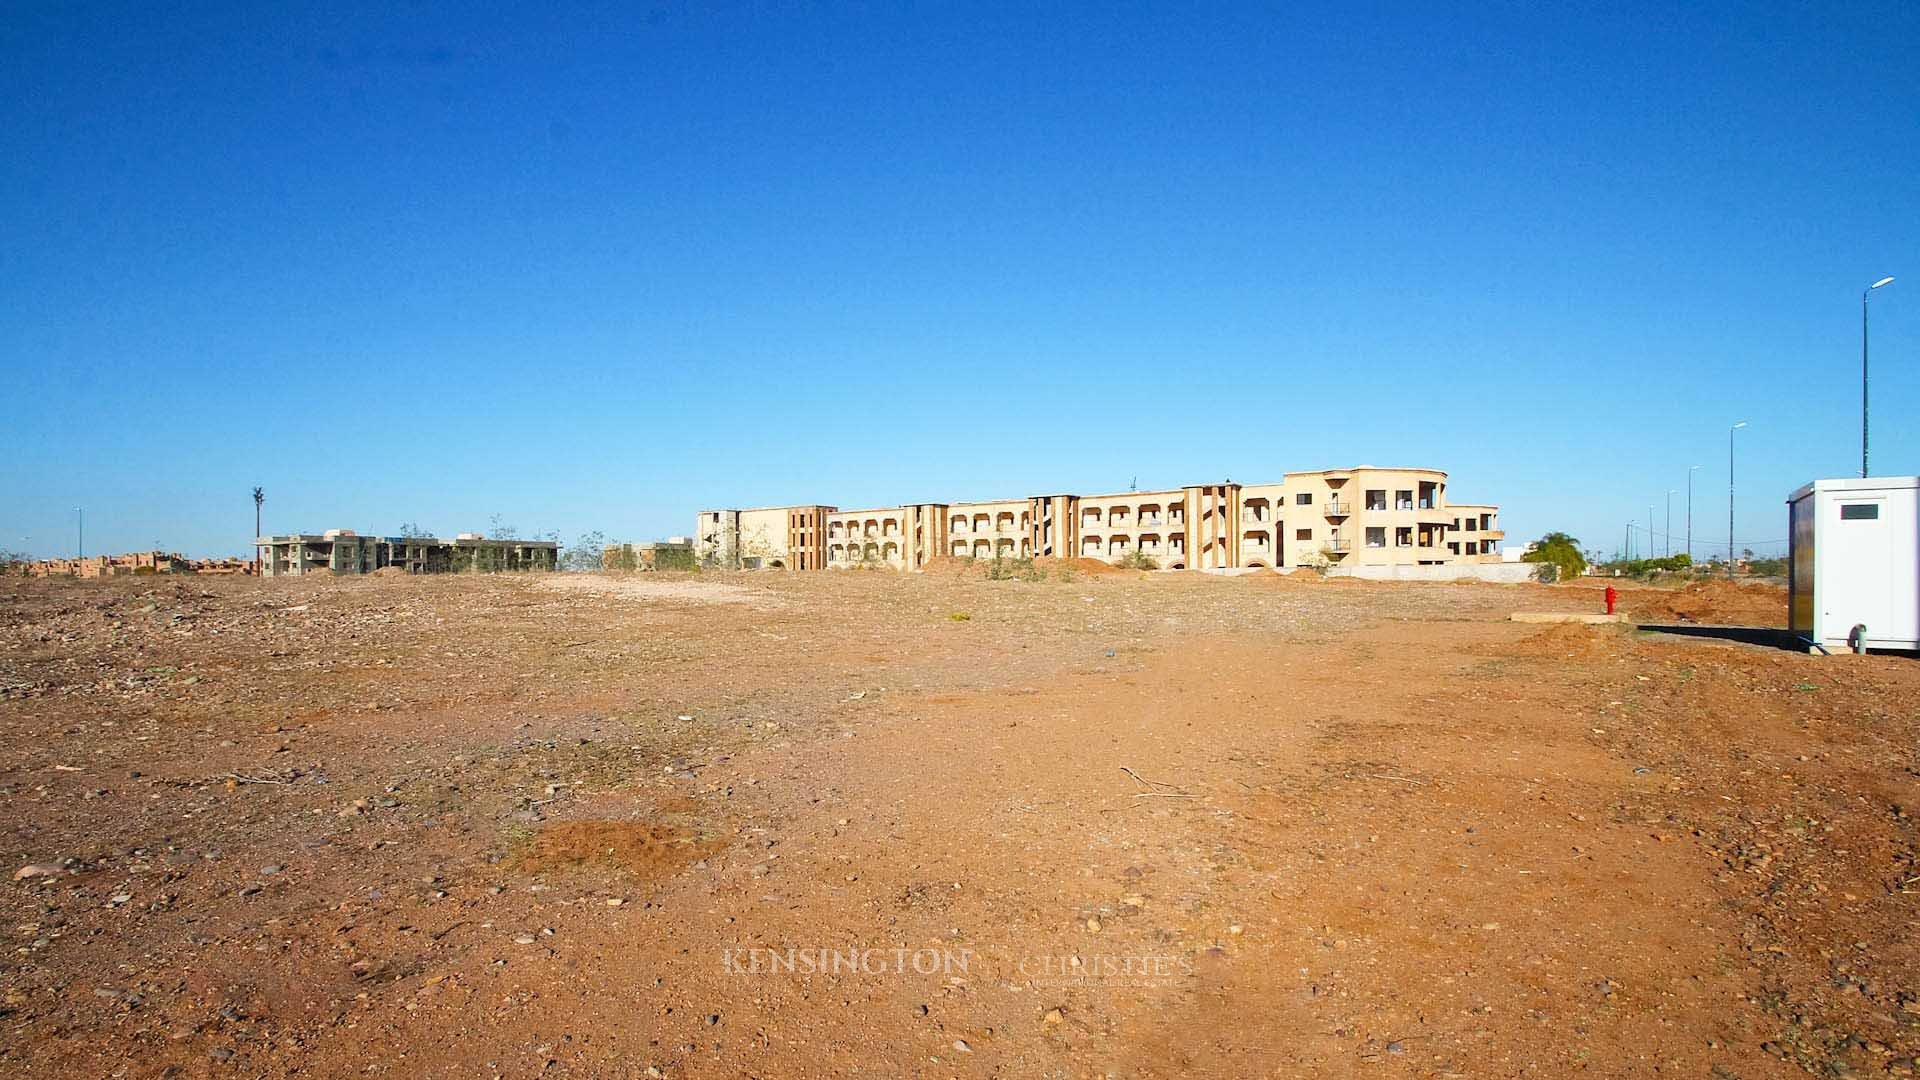 KPPM01120: Terrains Agdal Building land Marrakech Morocco